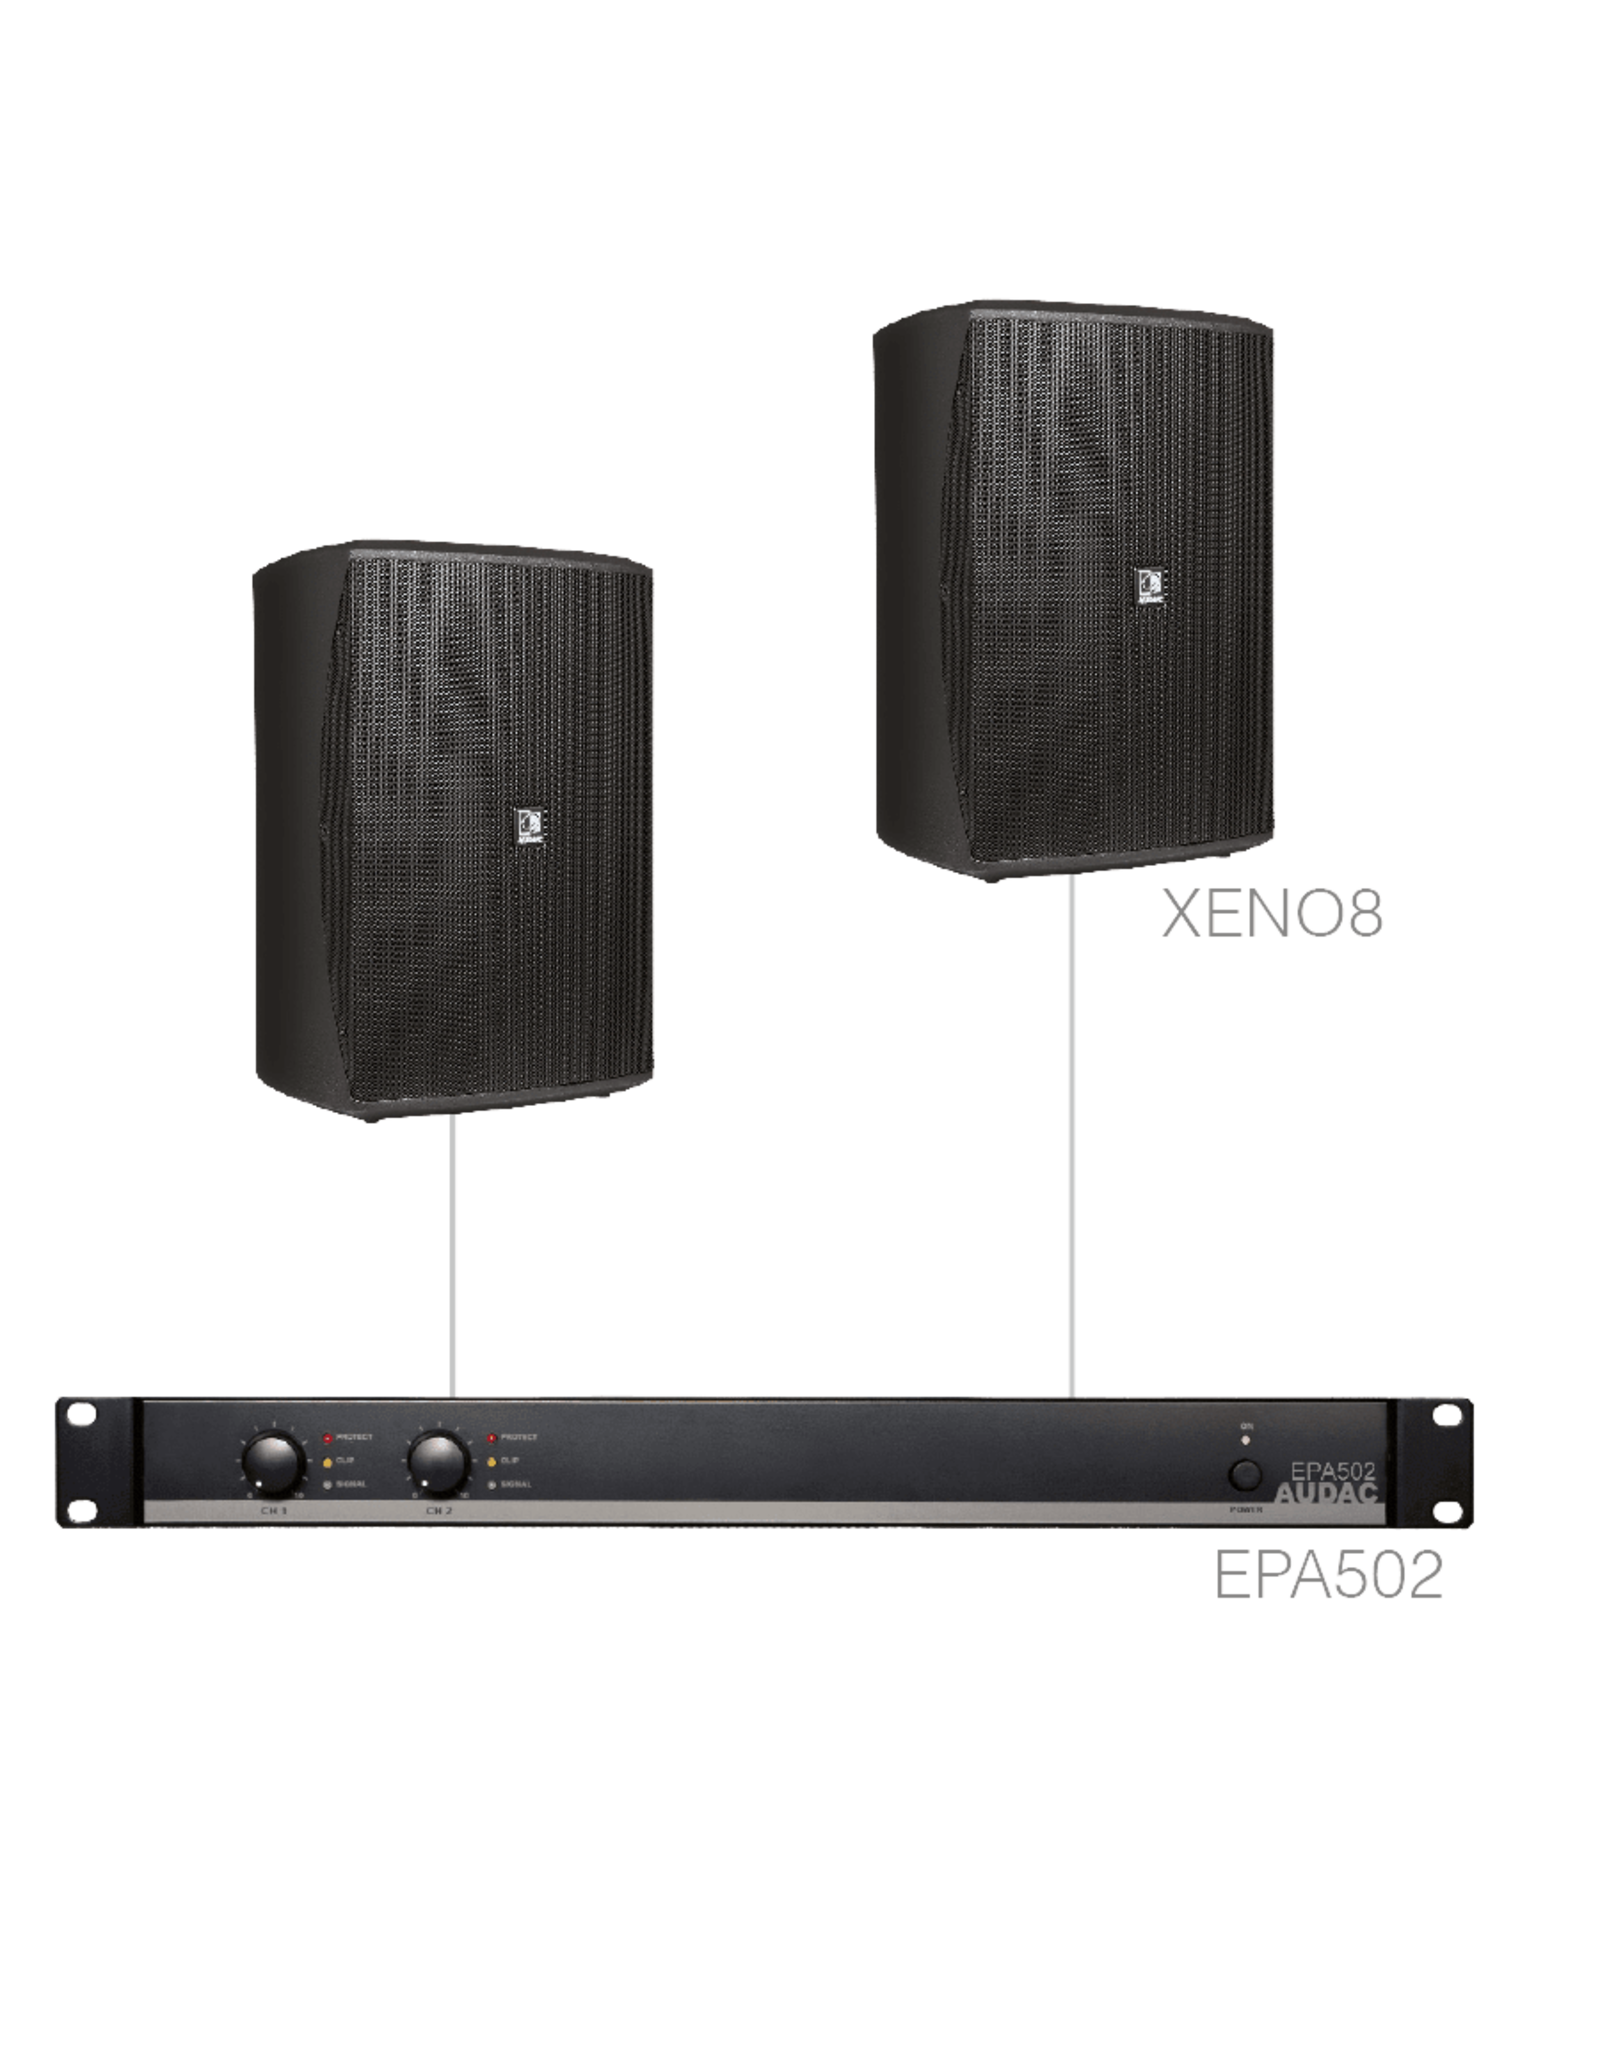 Audac 2 x XENO8 + EPA502 Black